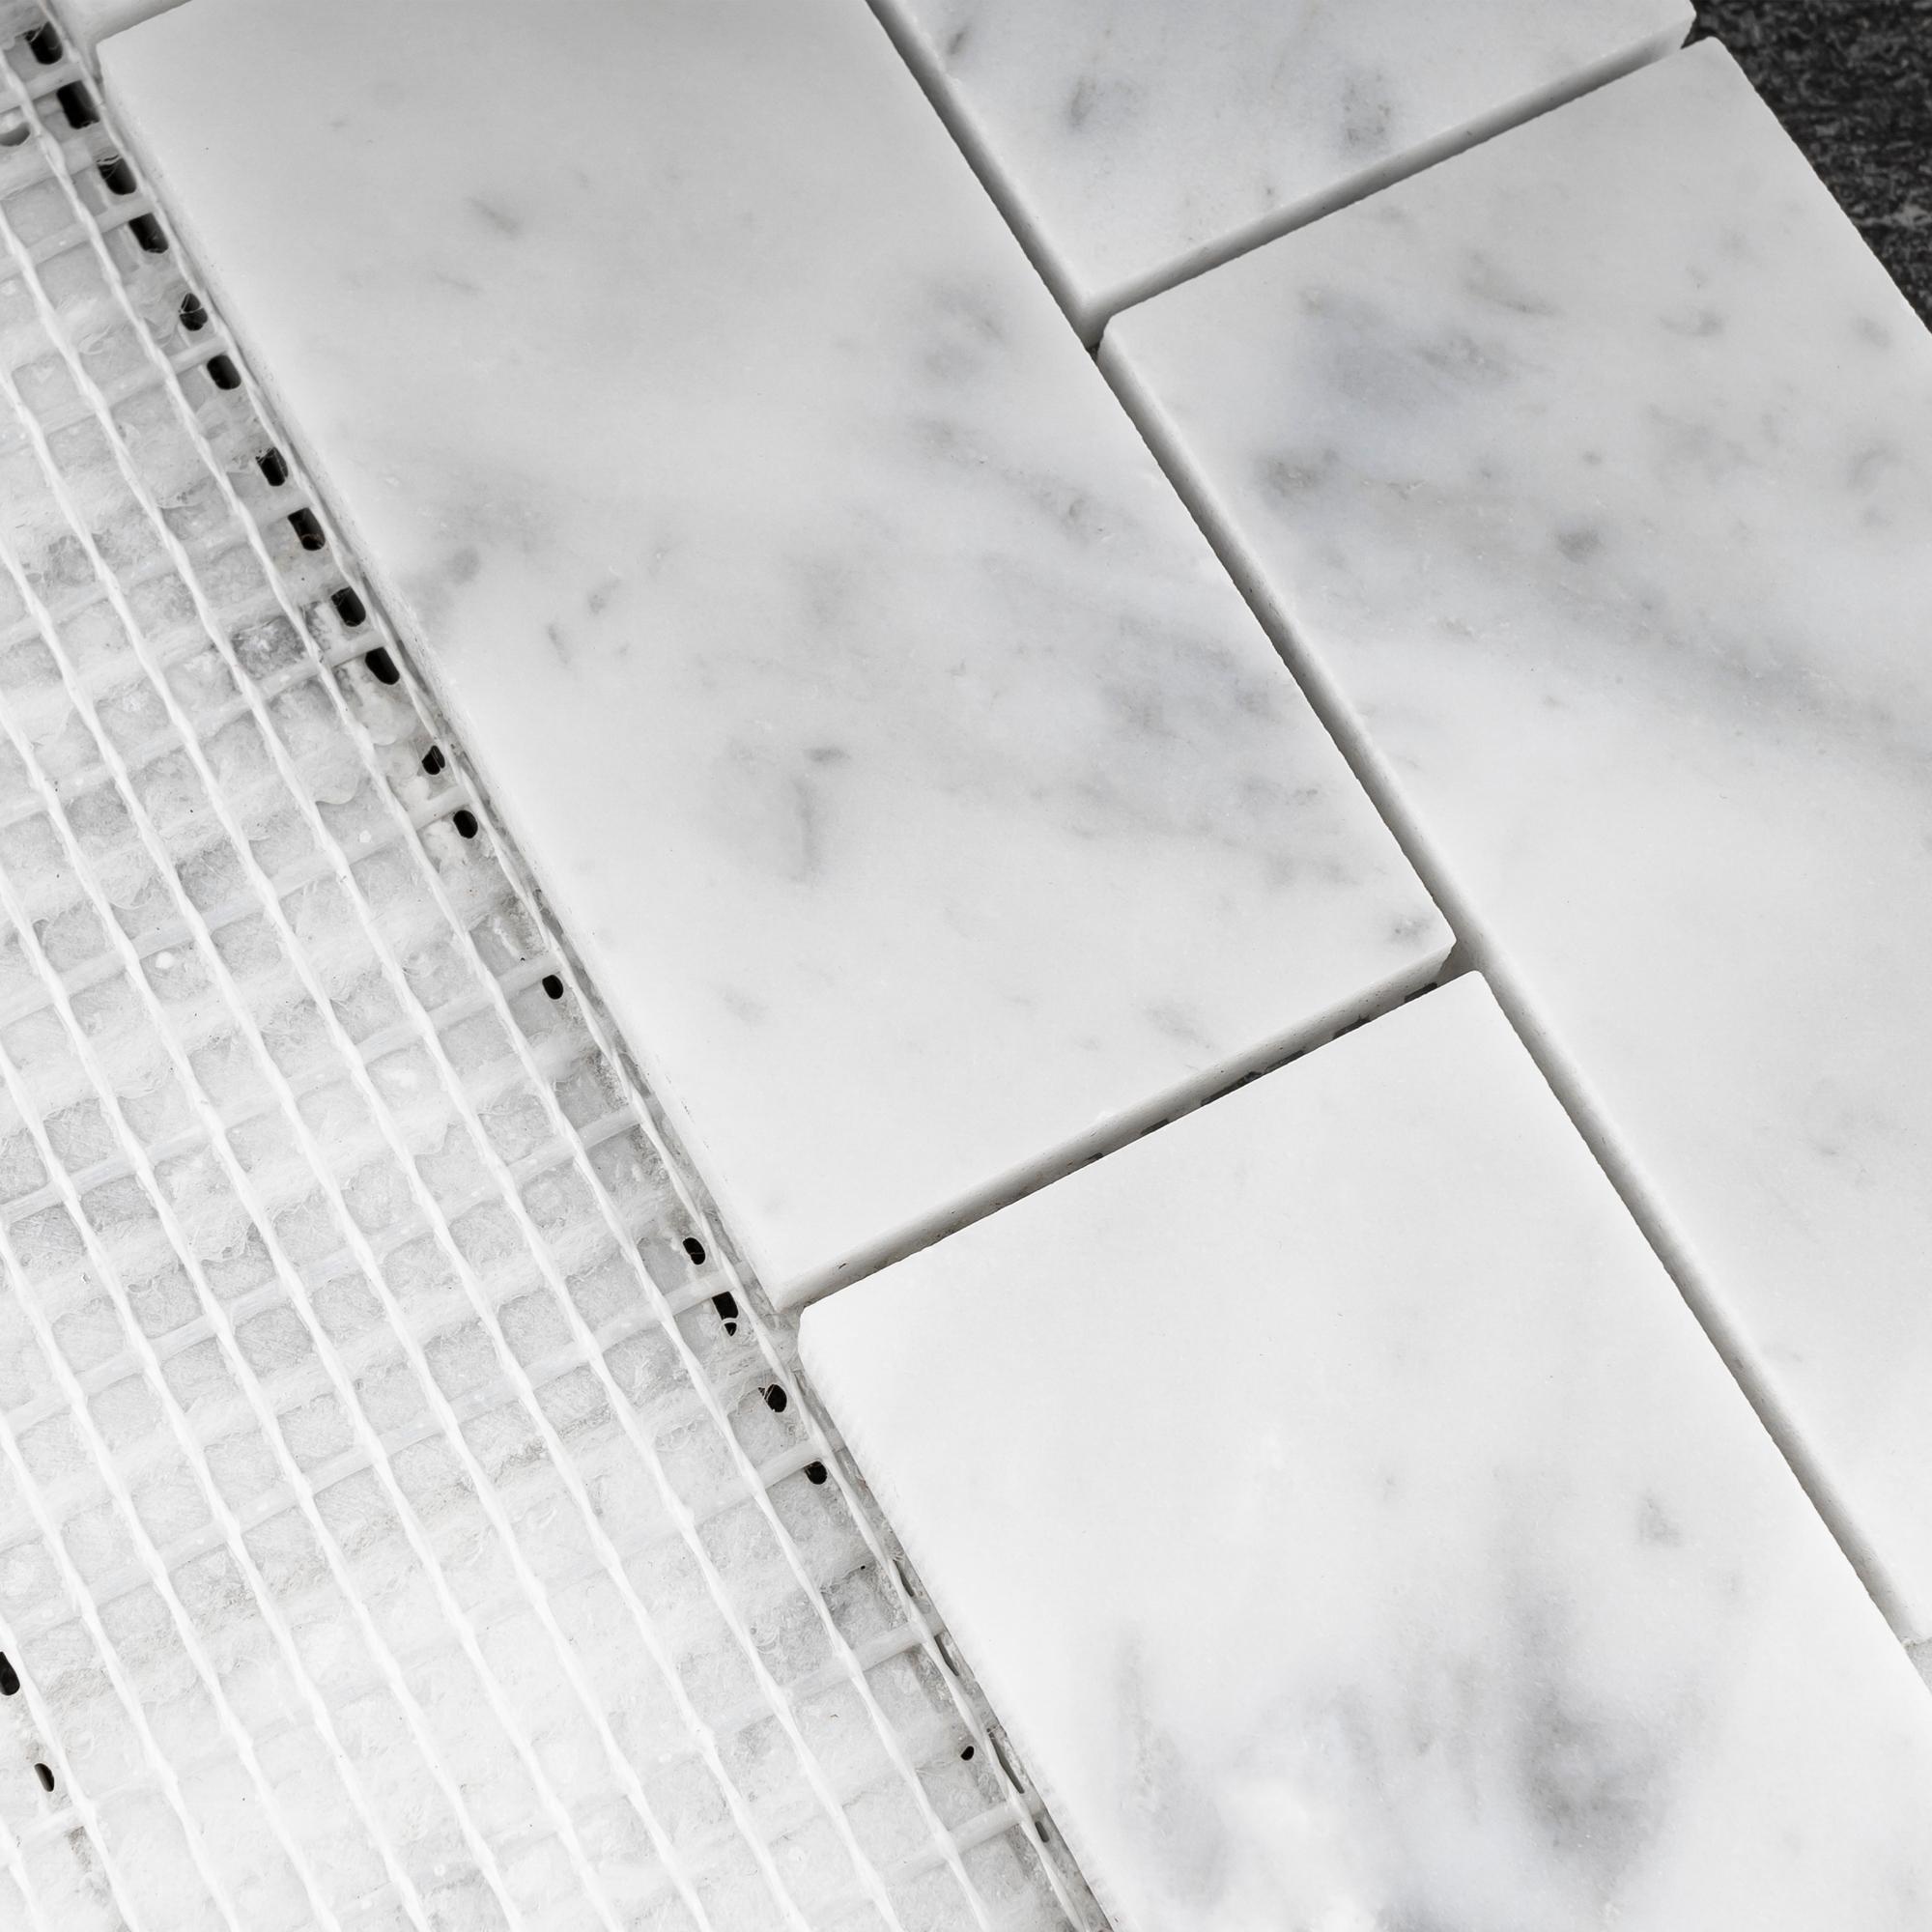 Tilegen Rectangle 2 X4 White Carrara Marble Subway Tile In White Floor And Wall Tile 10 Sheets 9 6sqft Overstock 27973540